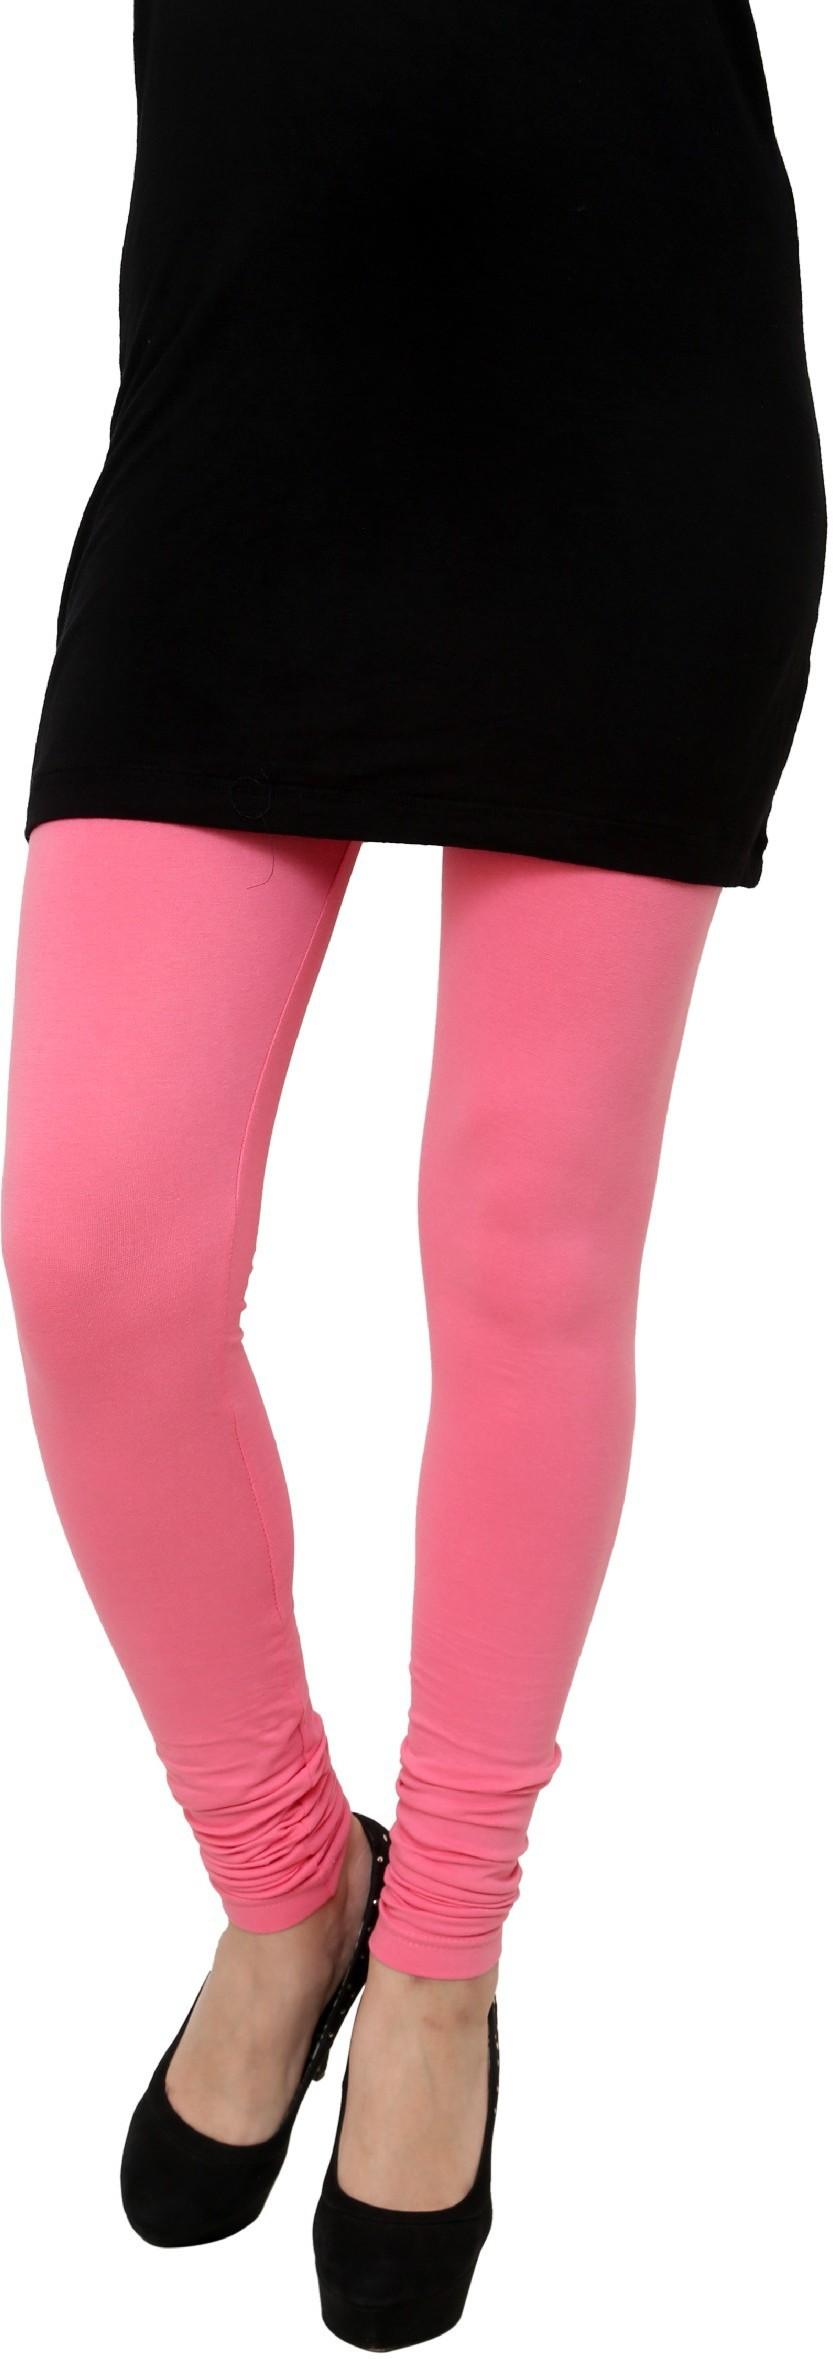 Gen Womens Pink Leggings